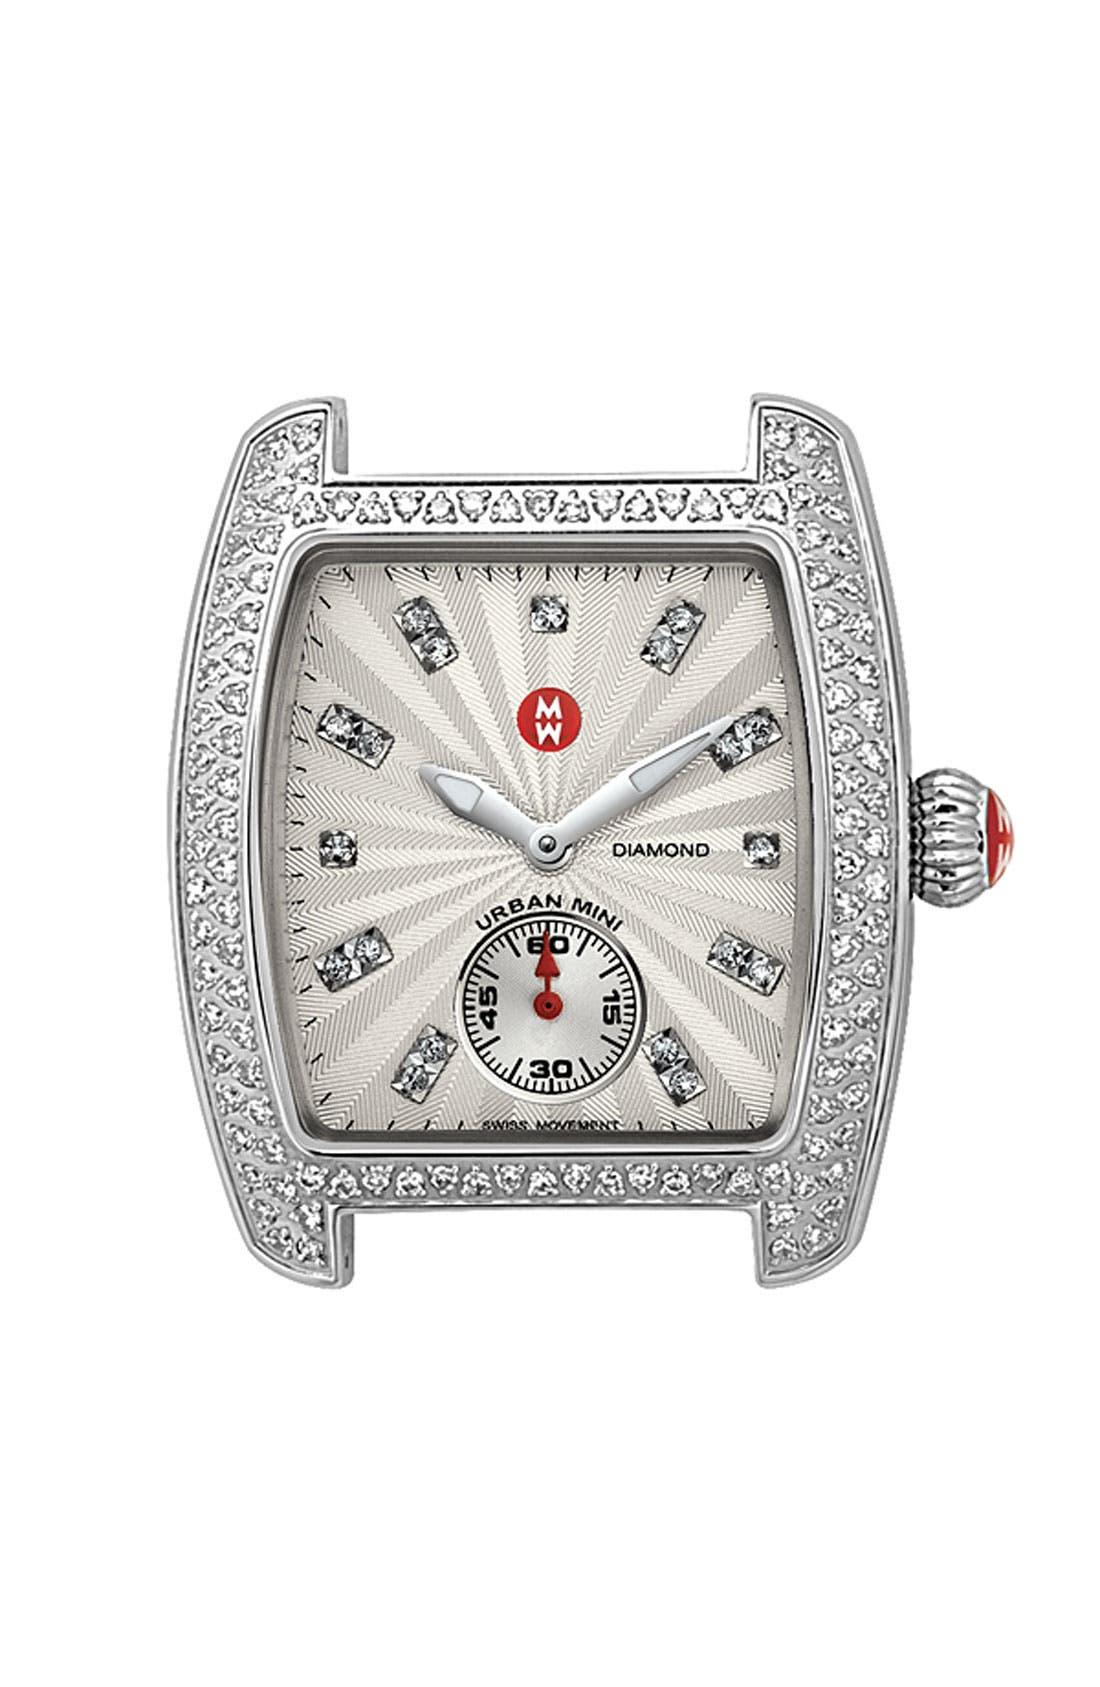 Main Image - MICHELE 'Urban Mini Diamond' Diamond Dial Watch Case, 29mm x 30mm